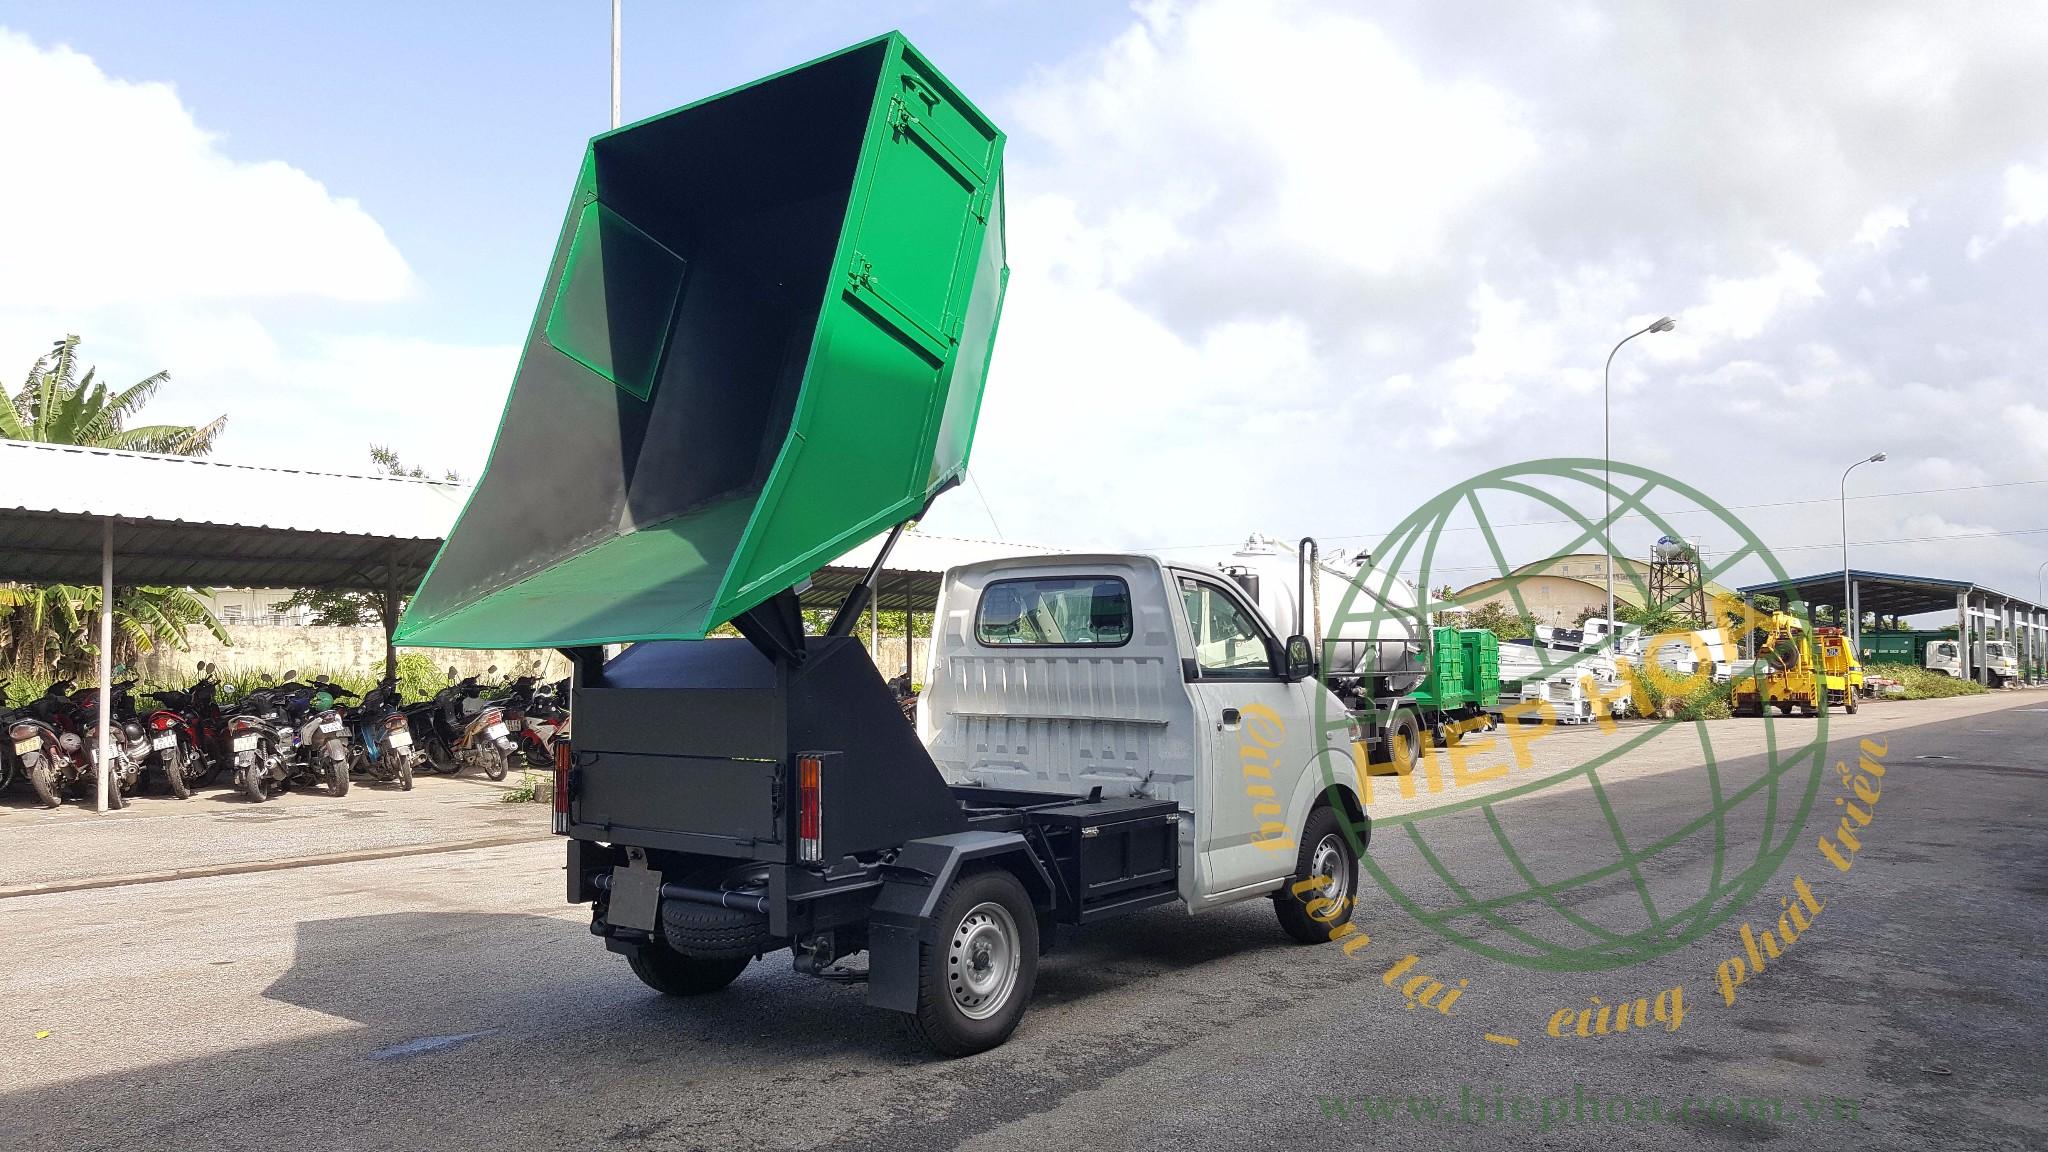 xe ben chở rác